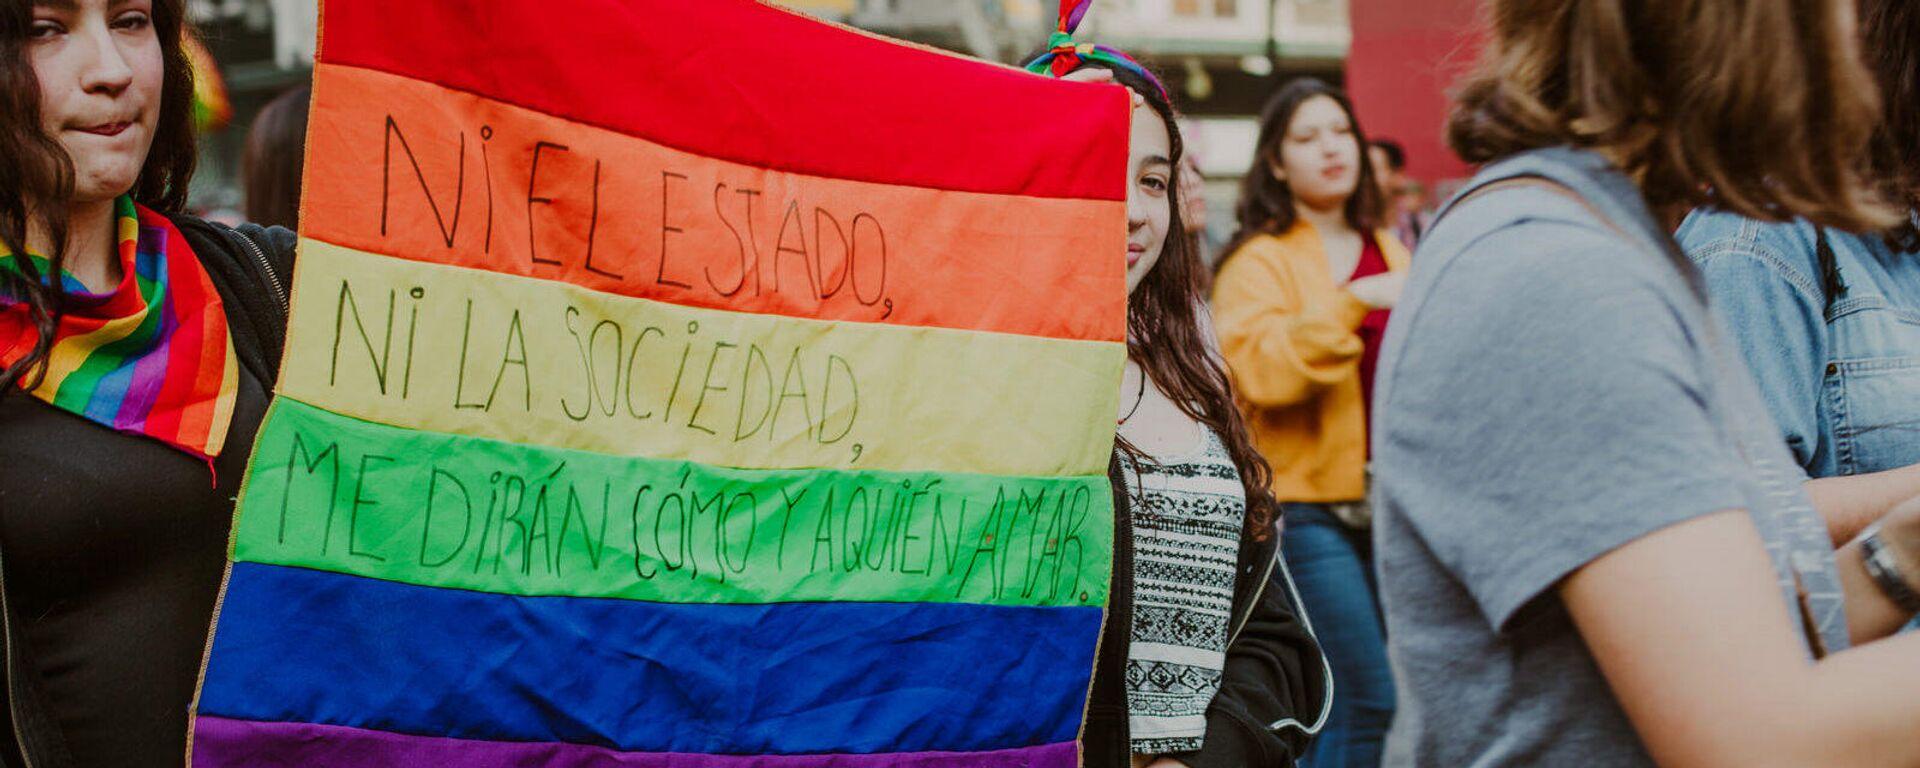 Marcha por el Orgullo LGBTI en Chile - Sputnik Mundo, 1920, 07.04.2021